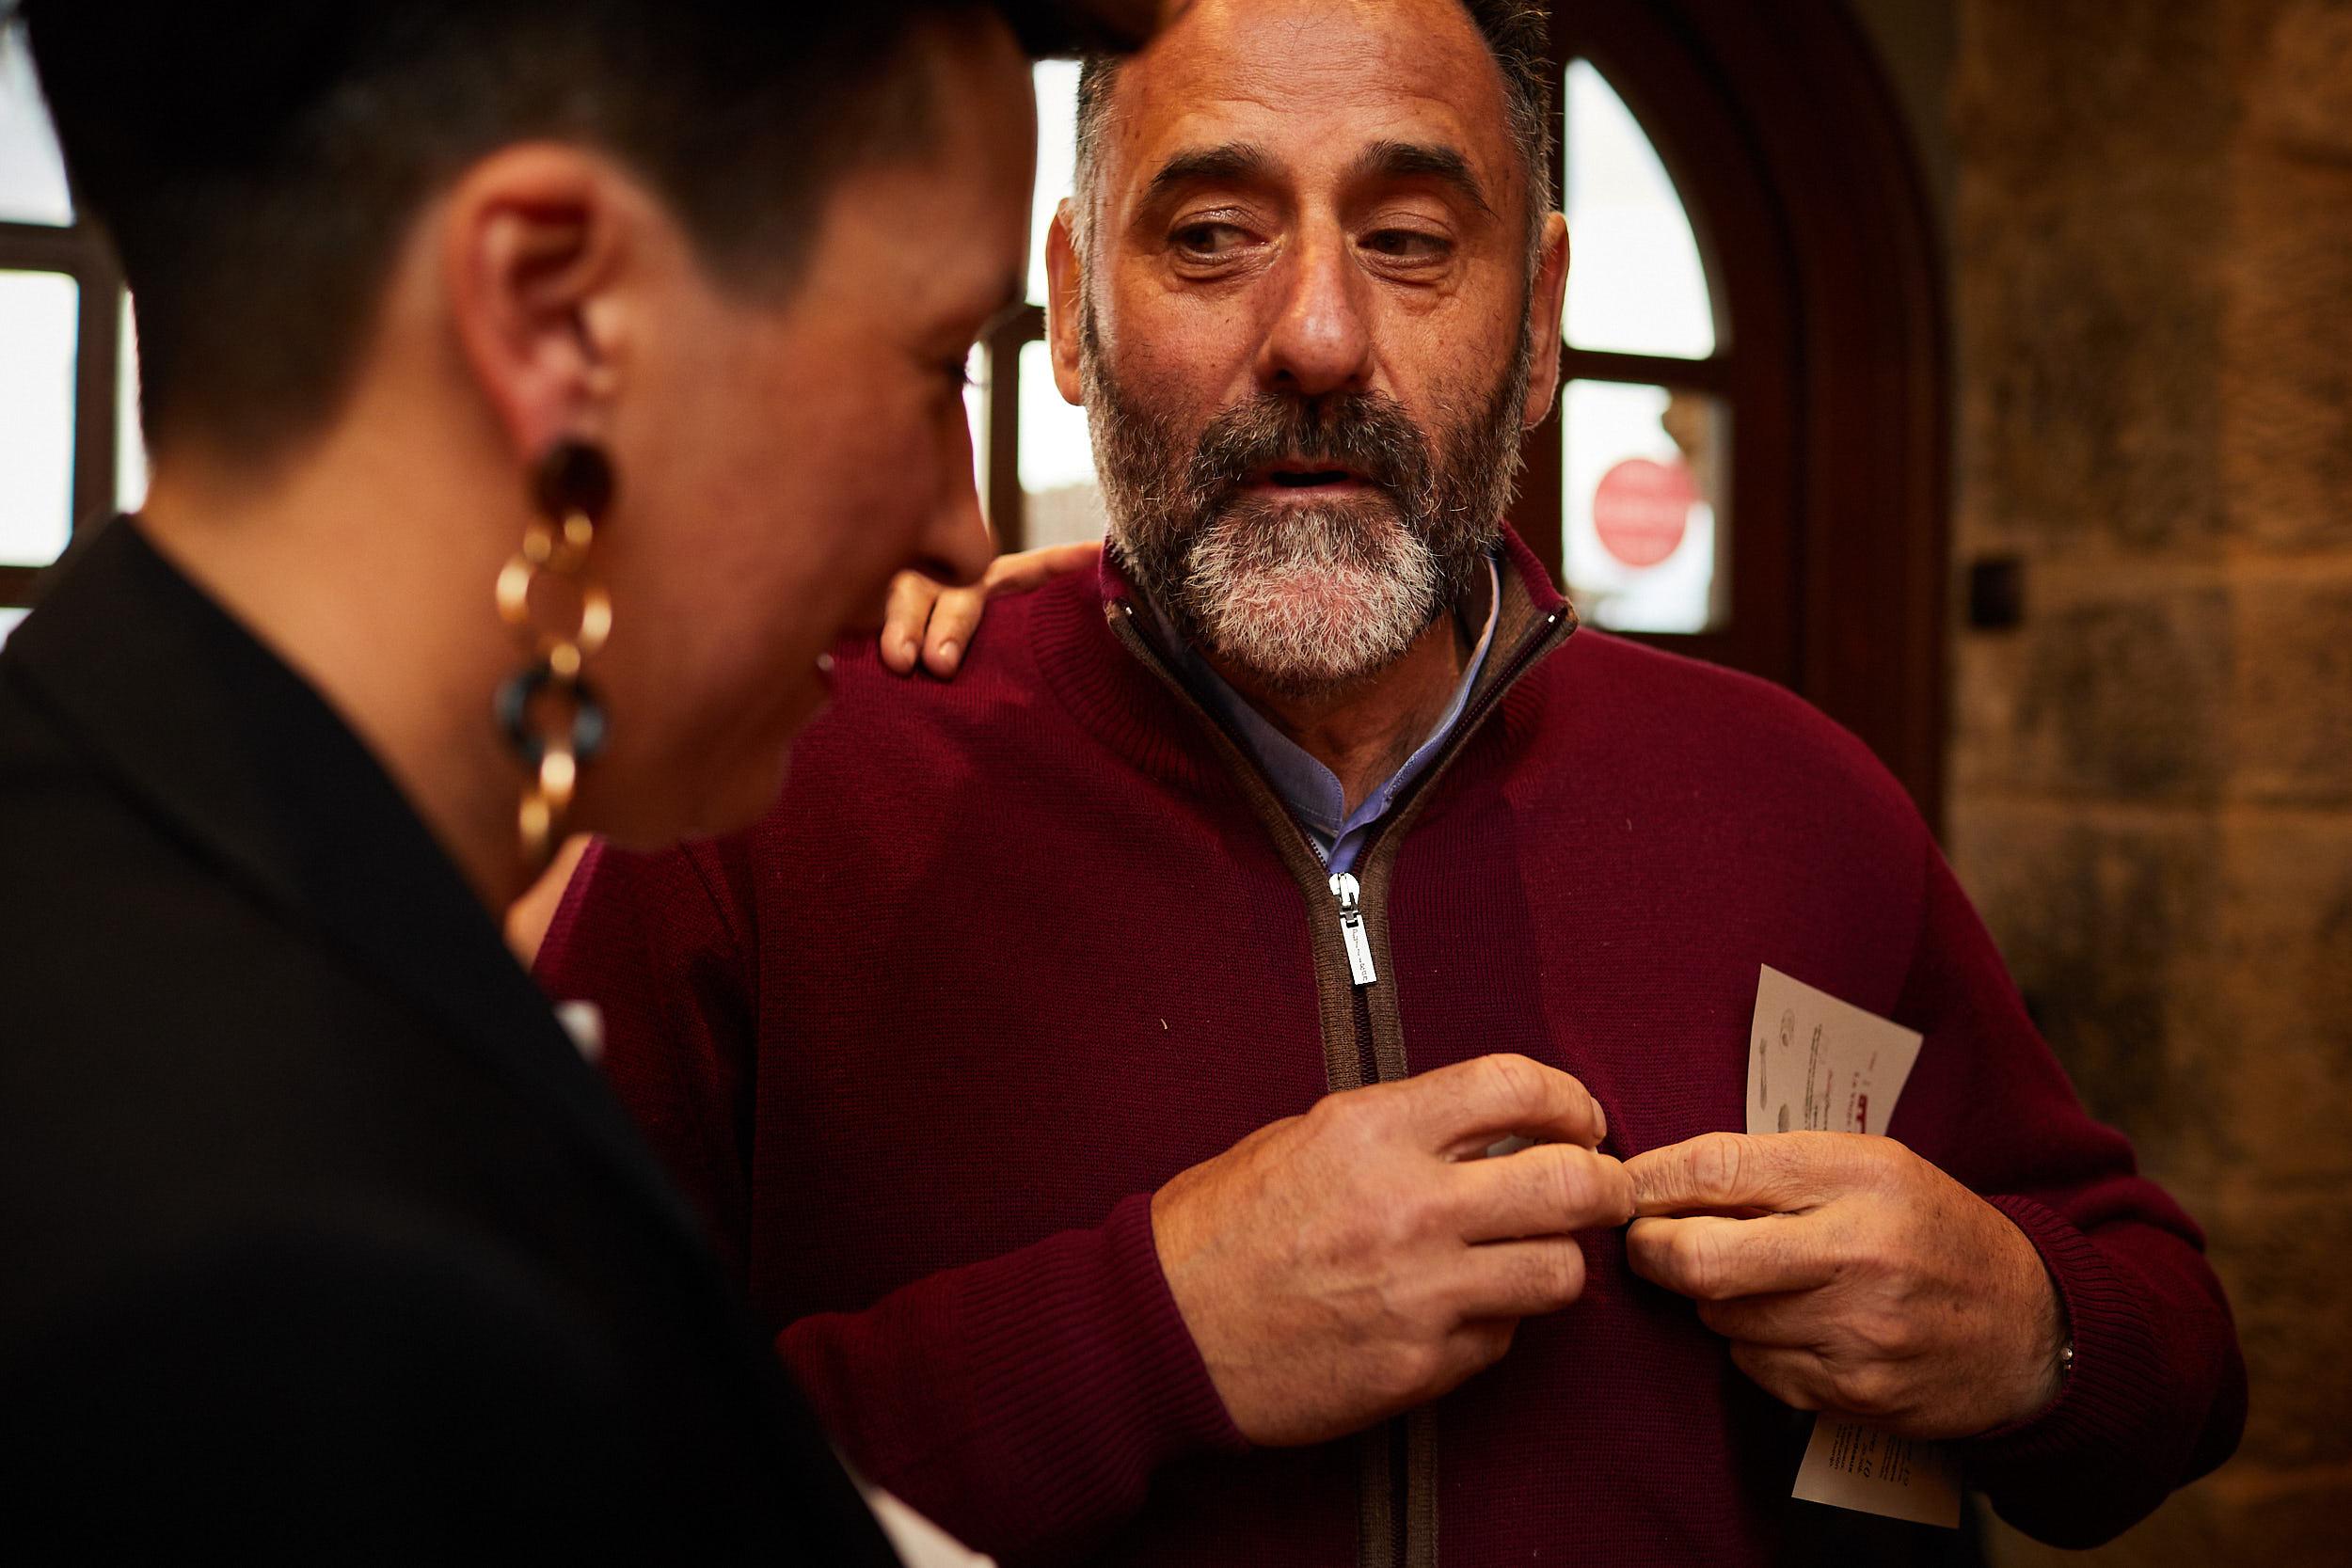 English-speaking professional photographer in Spain | Restaurante La Vieja Bodega, Casalarreina (La Rioja)